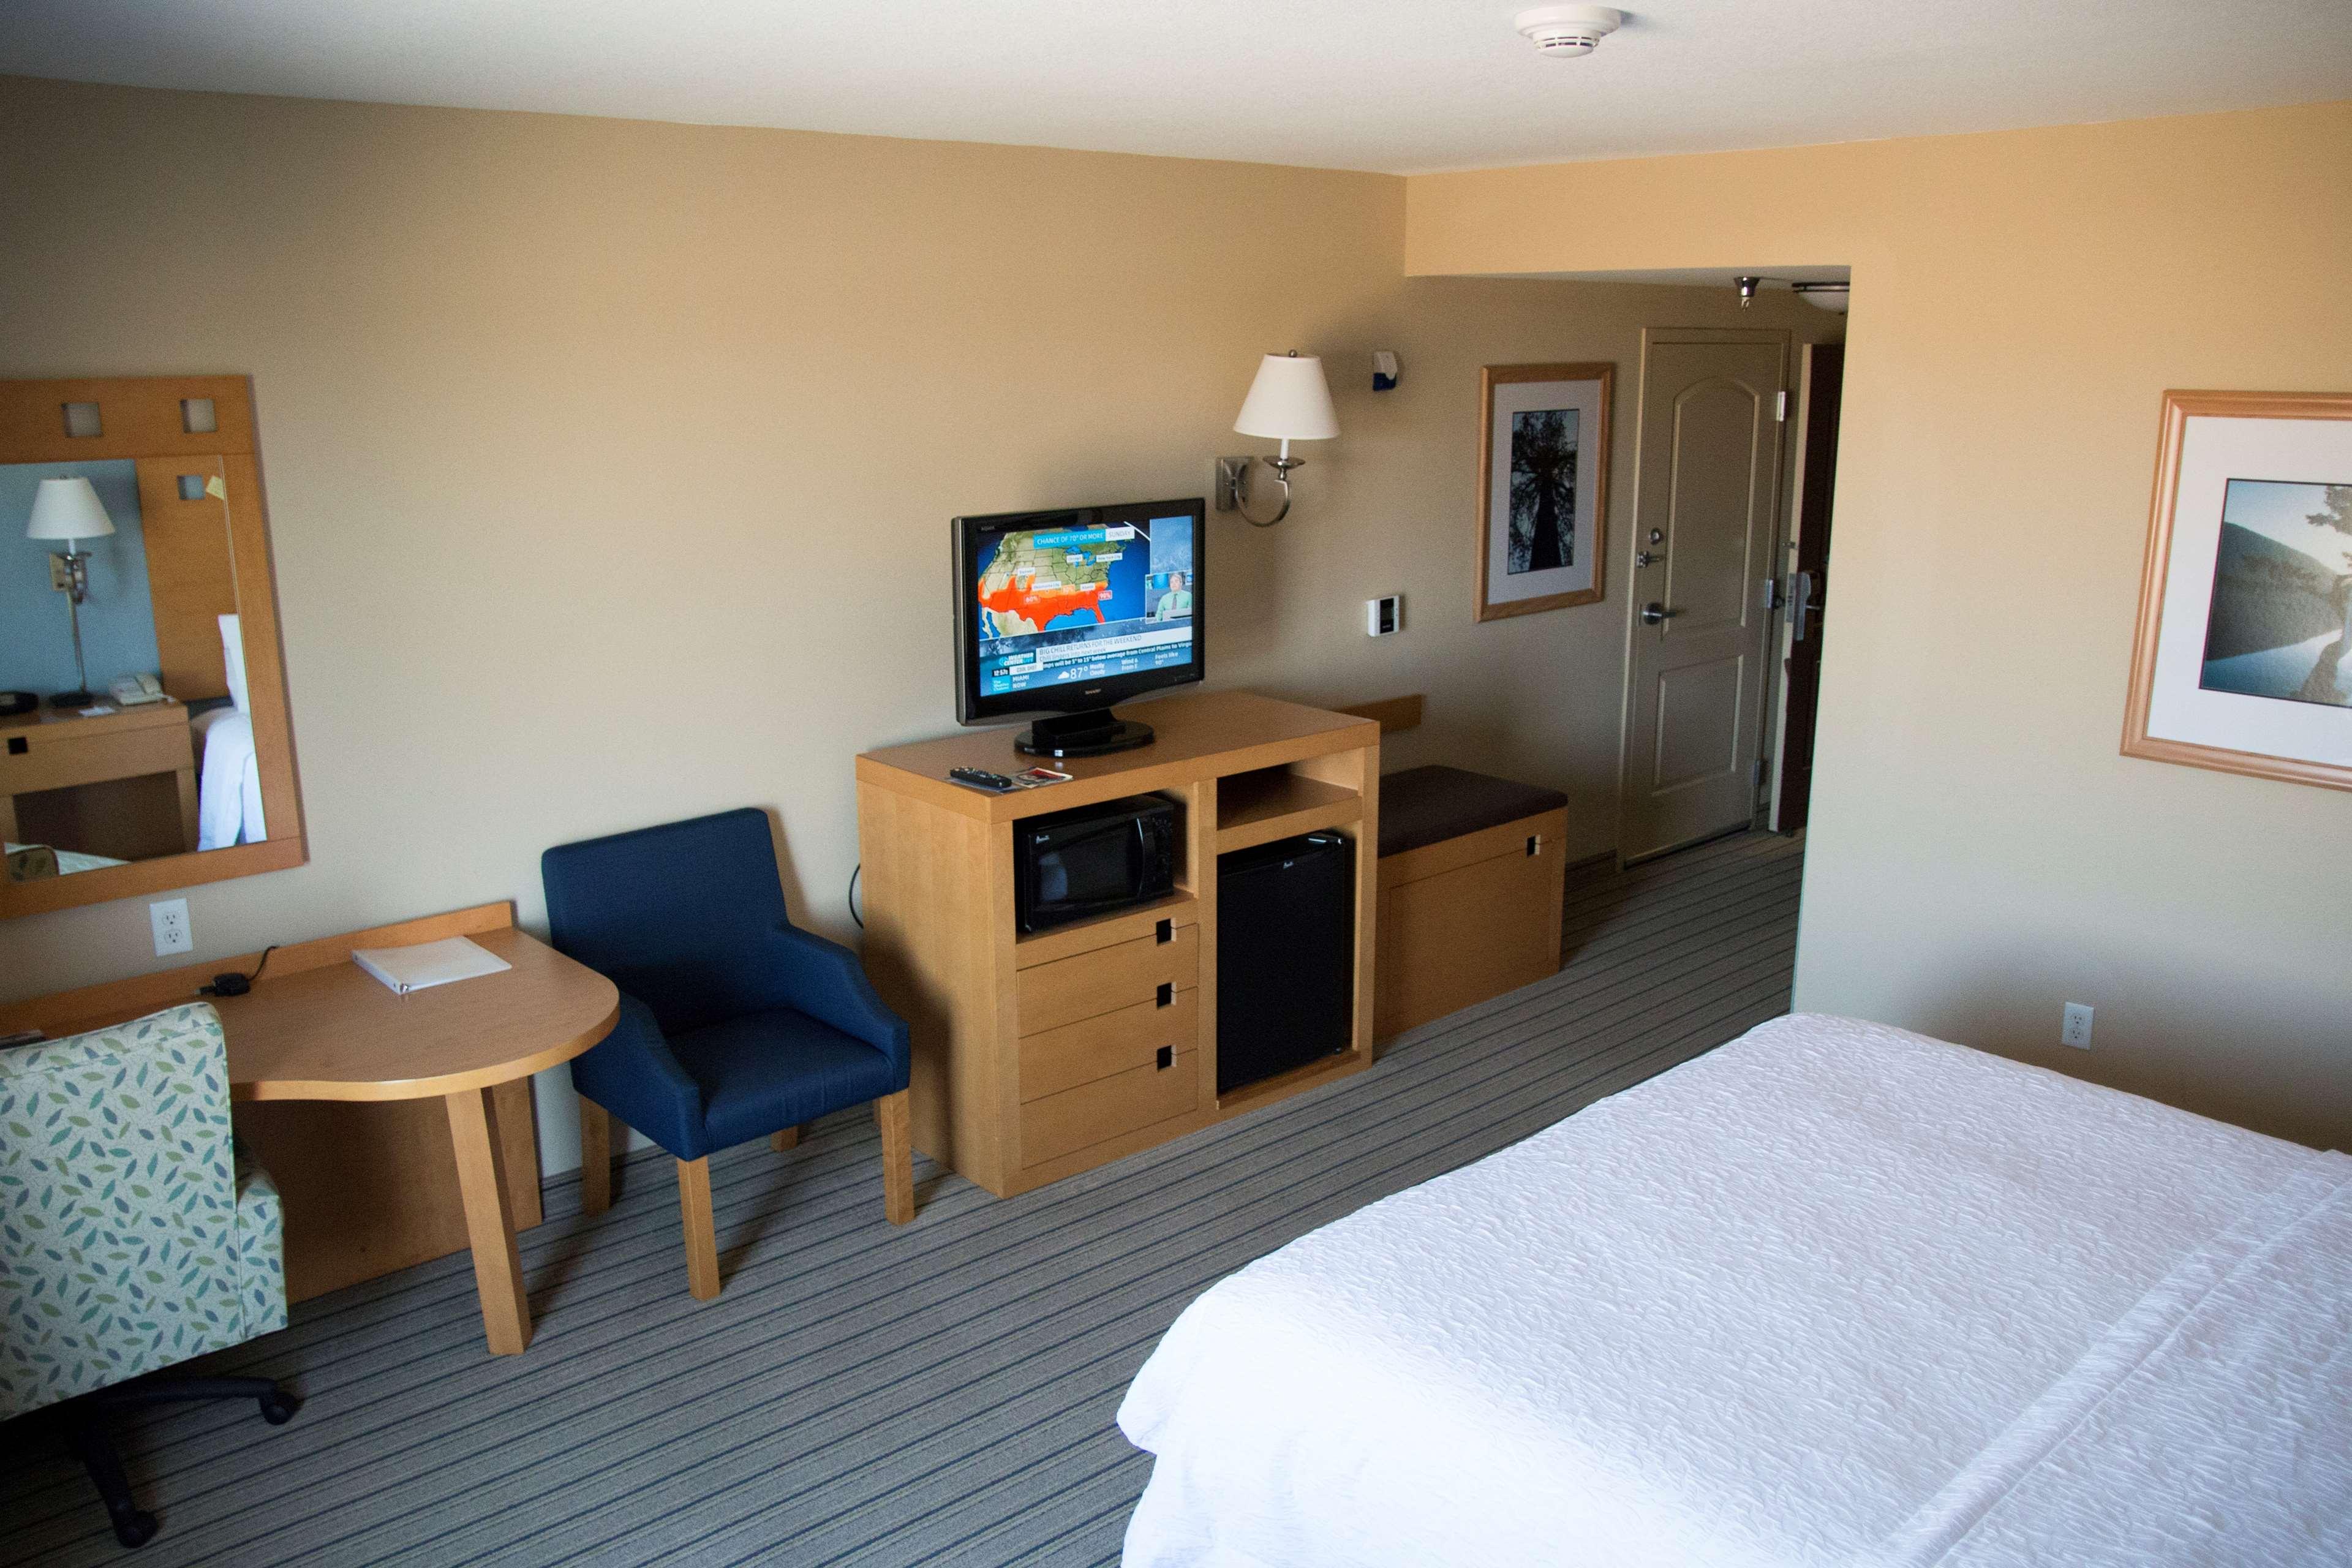 Hampton Inn & Suites Madera image 41